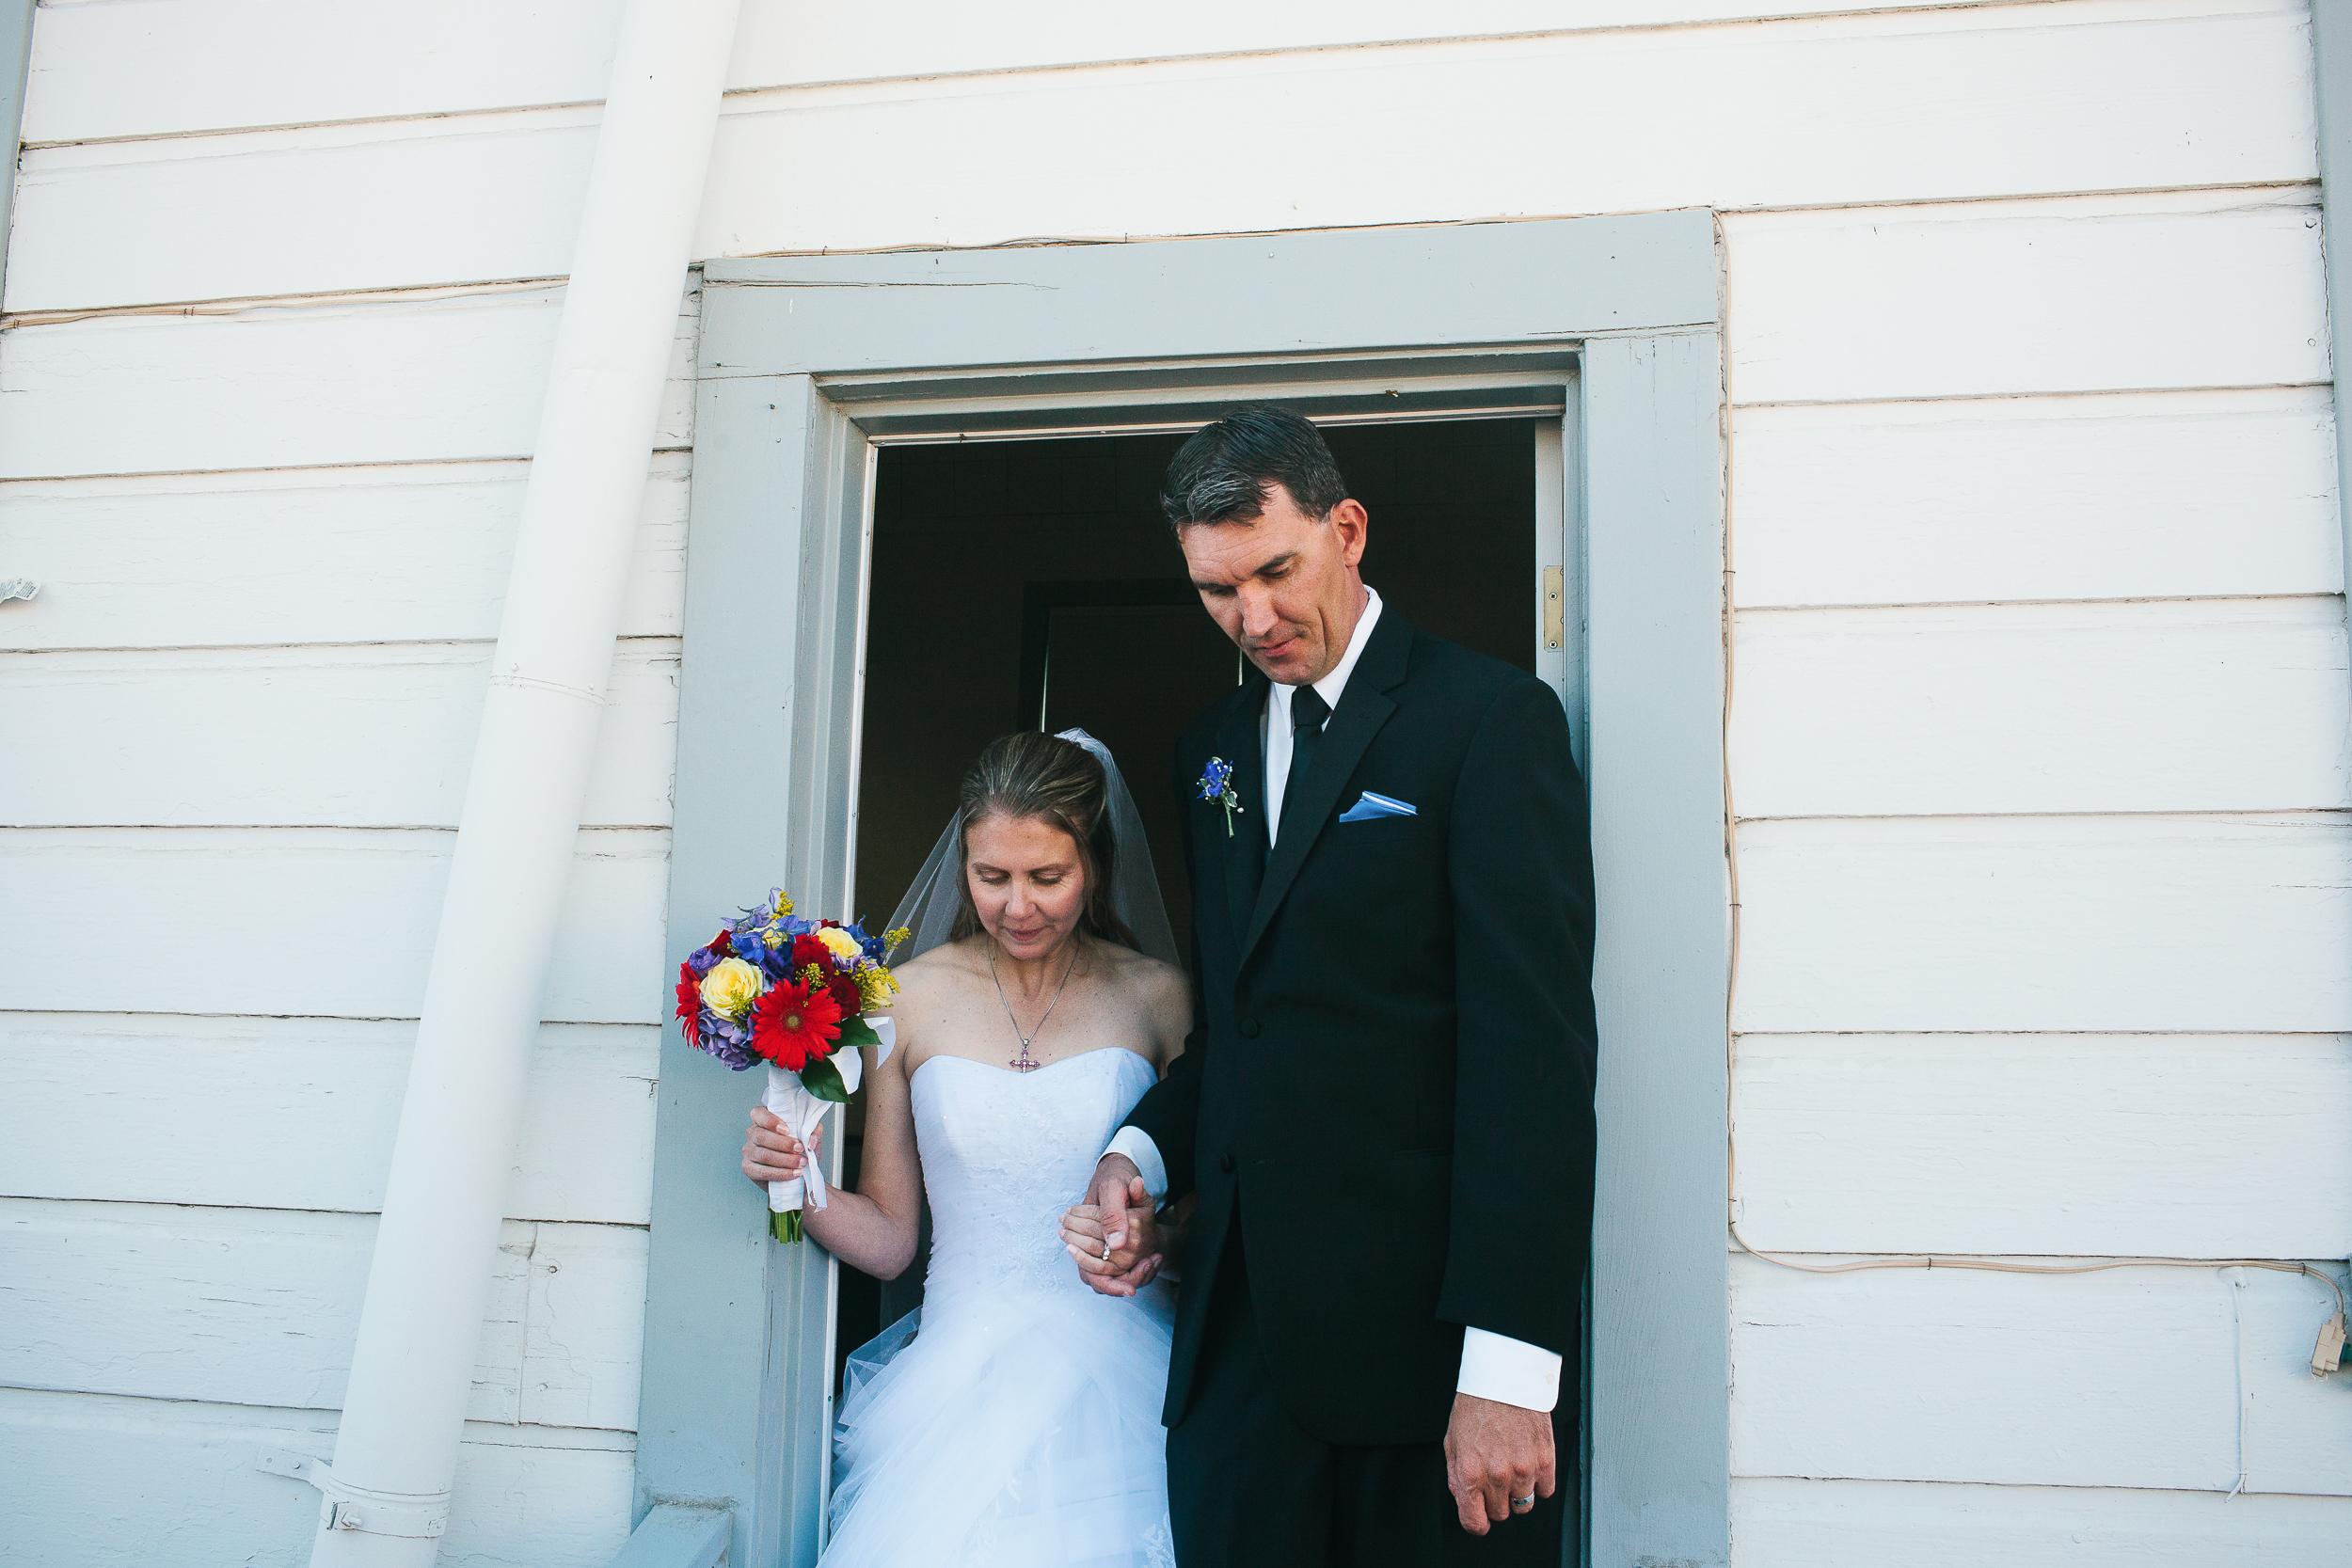 Anna_Wedding_SharonMcKeeman-55.jpg